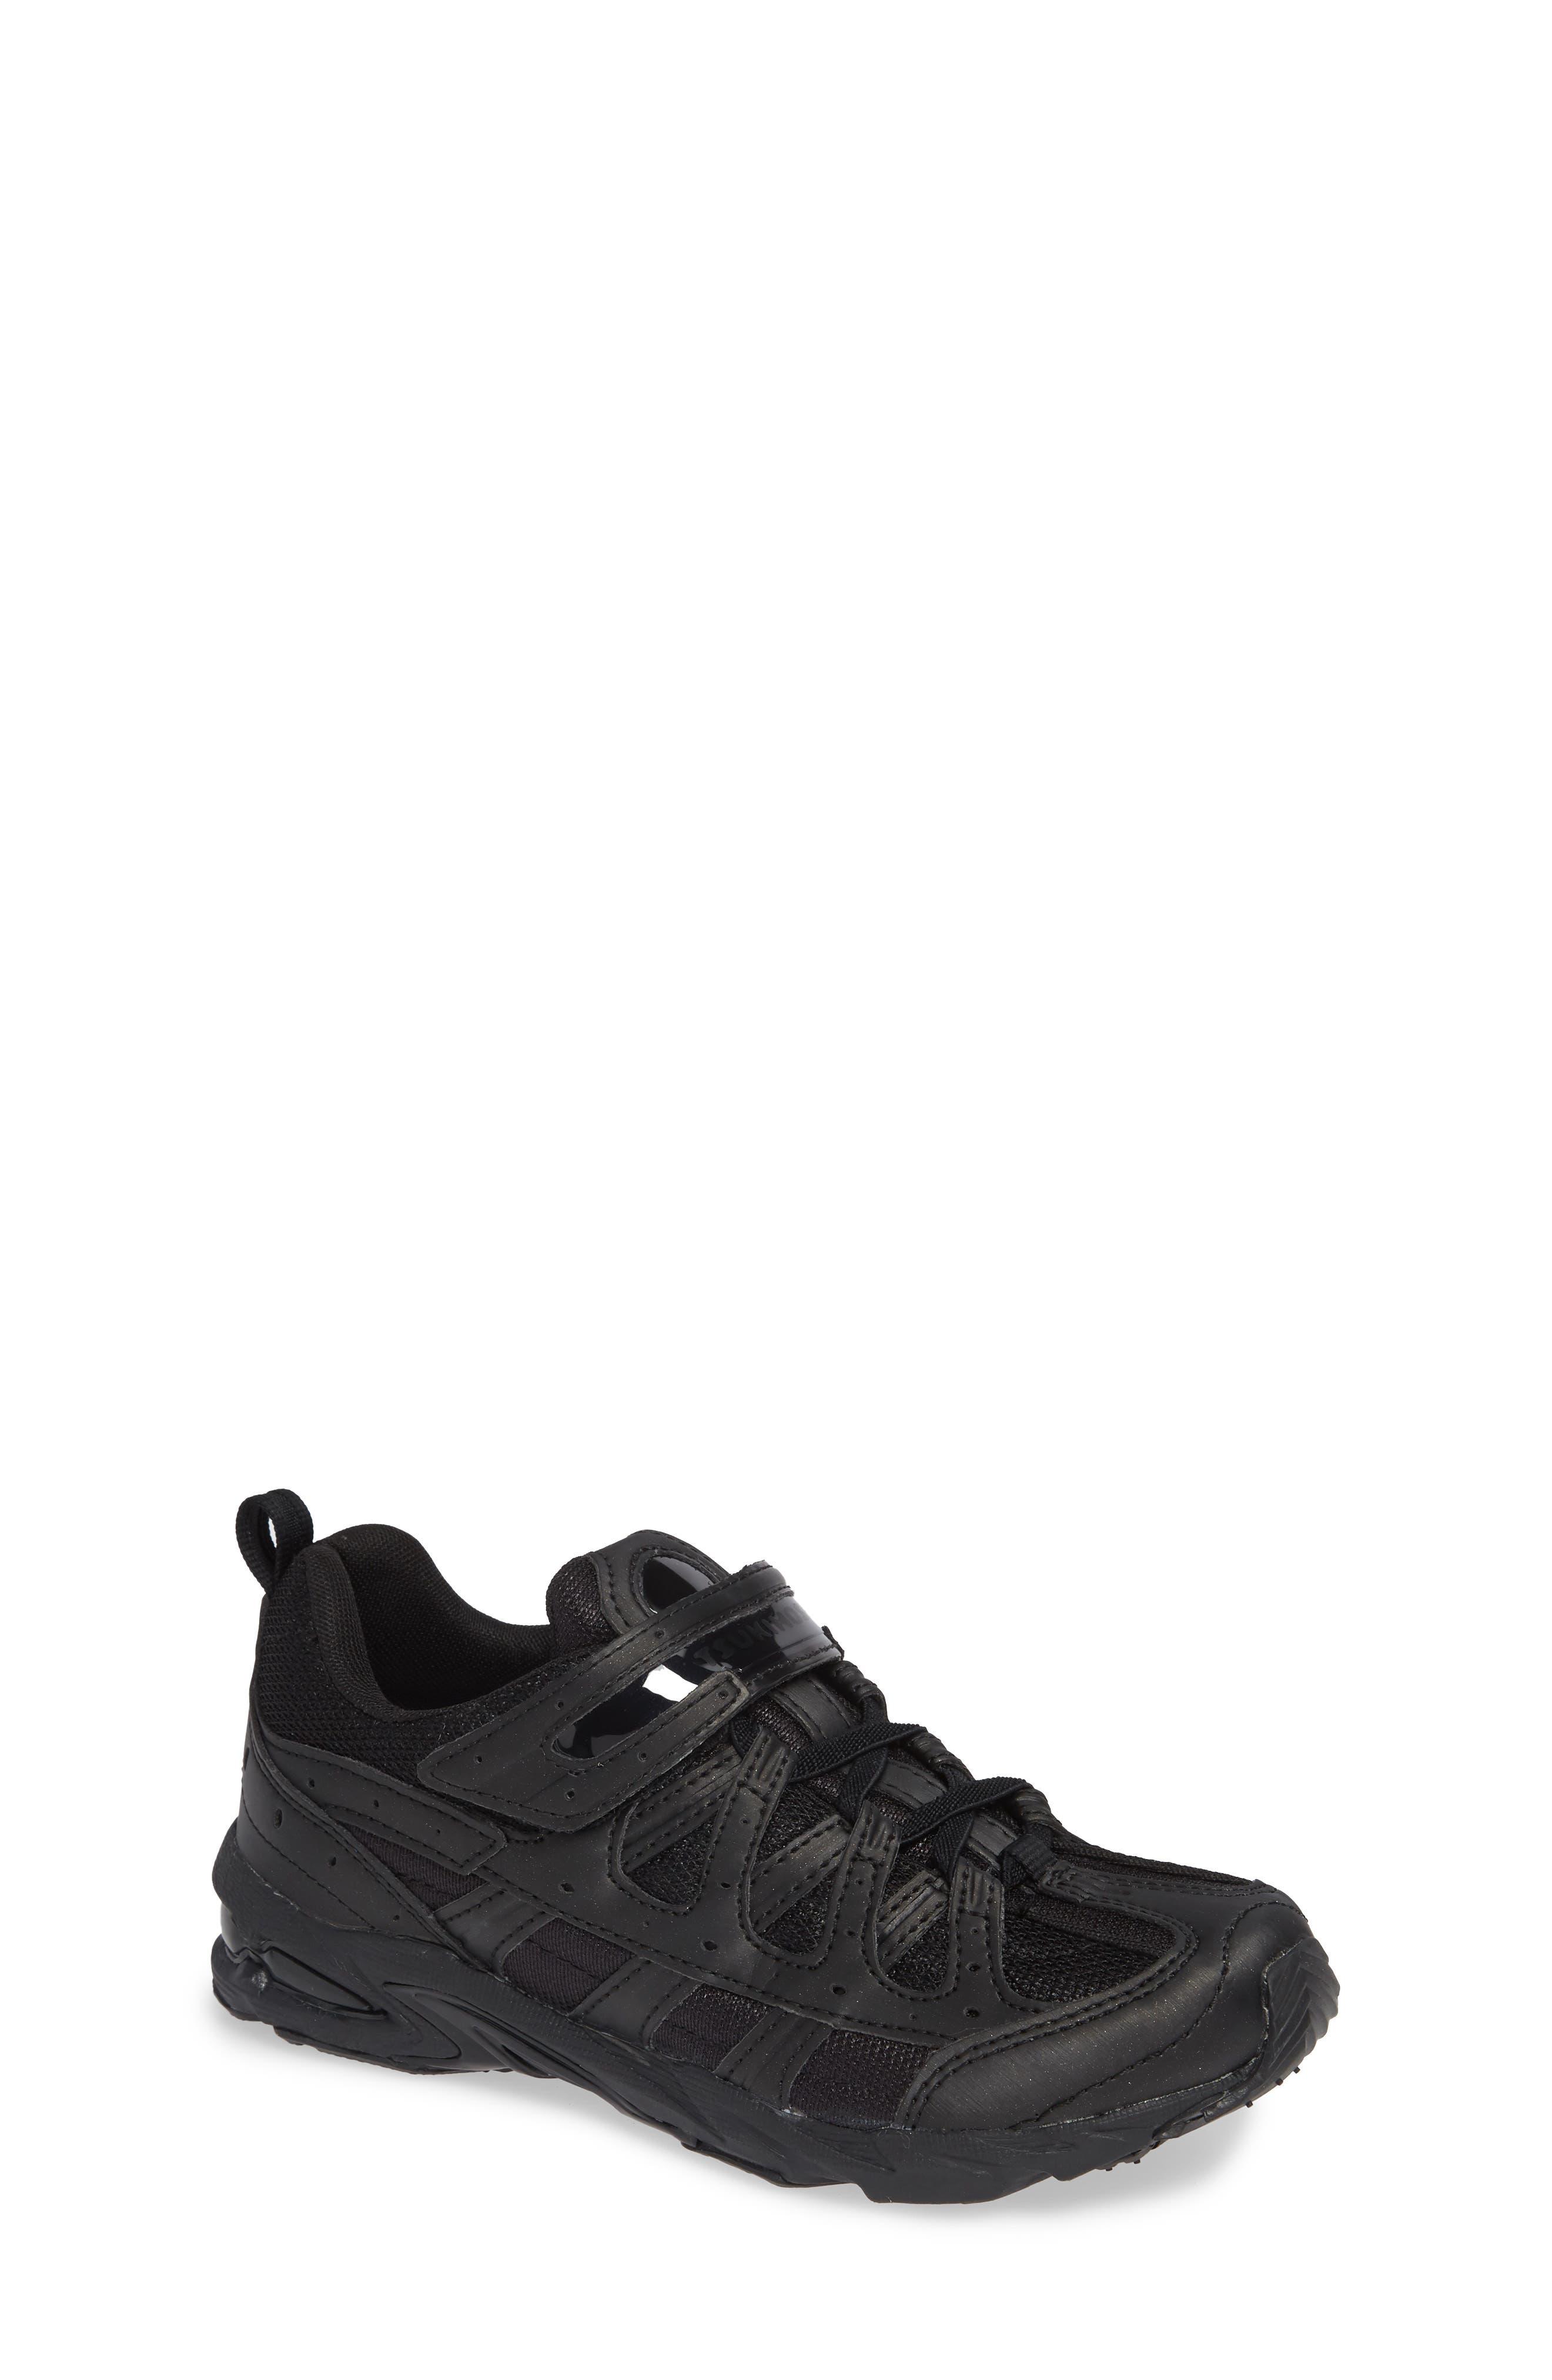 TSUKIHOSHI Speed Washable Sneaker, Main, color, BLACK/ NOIR